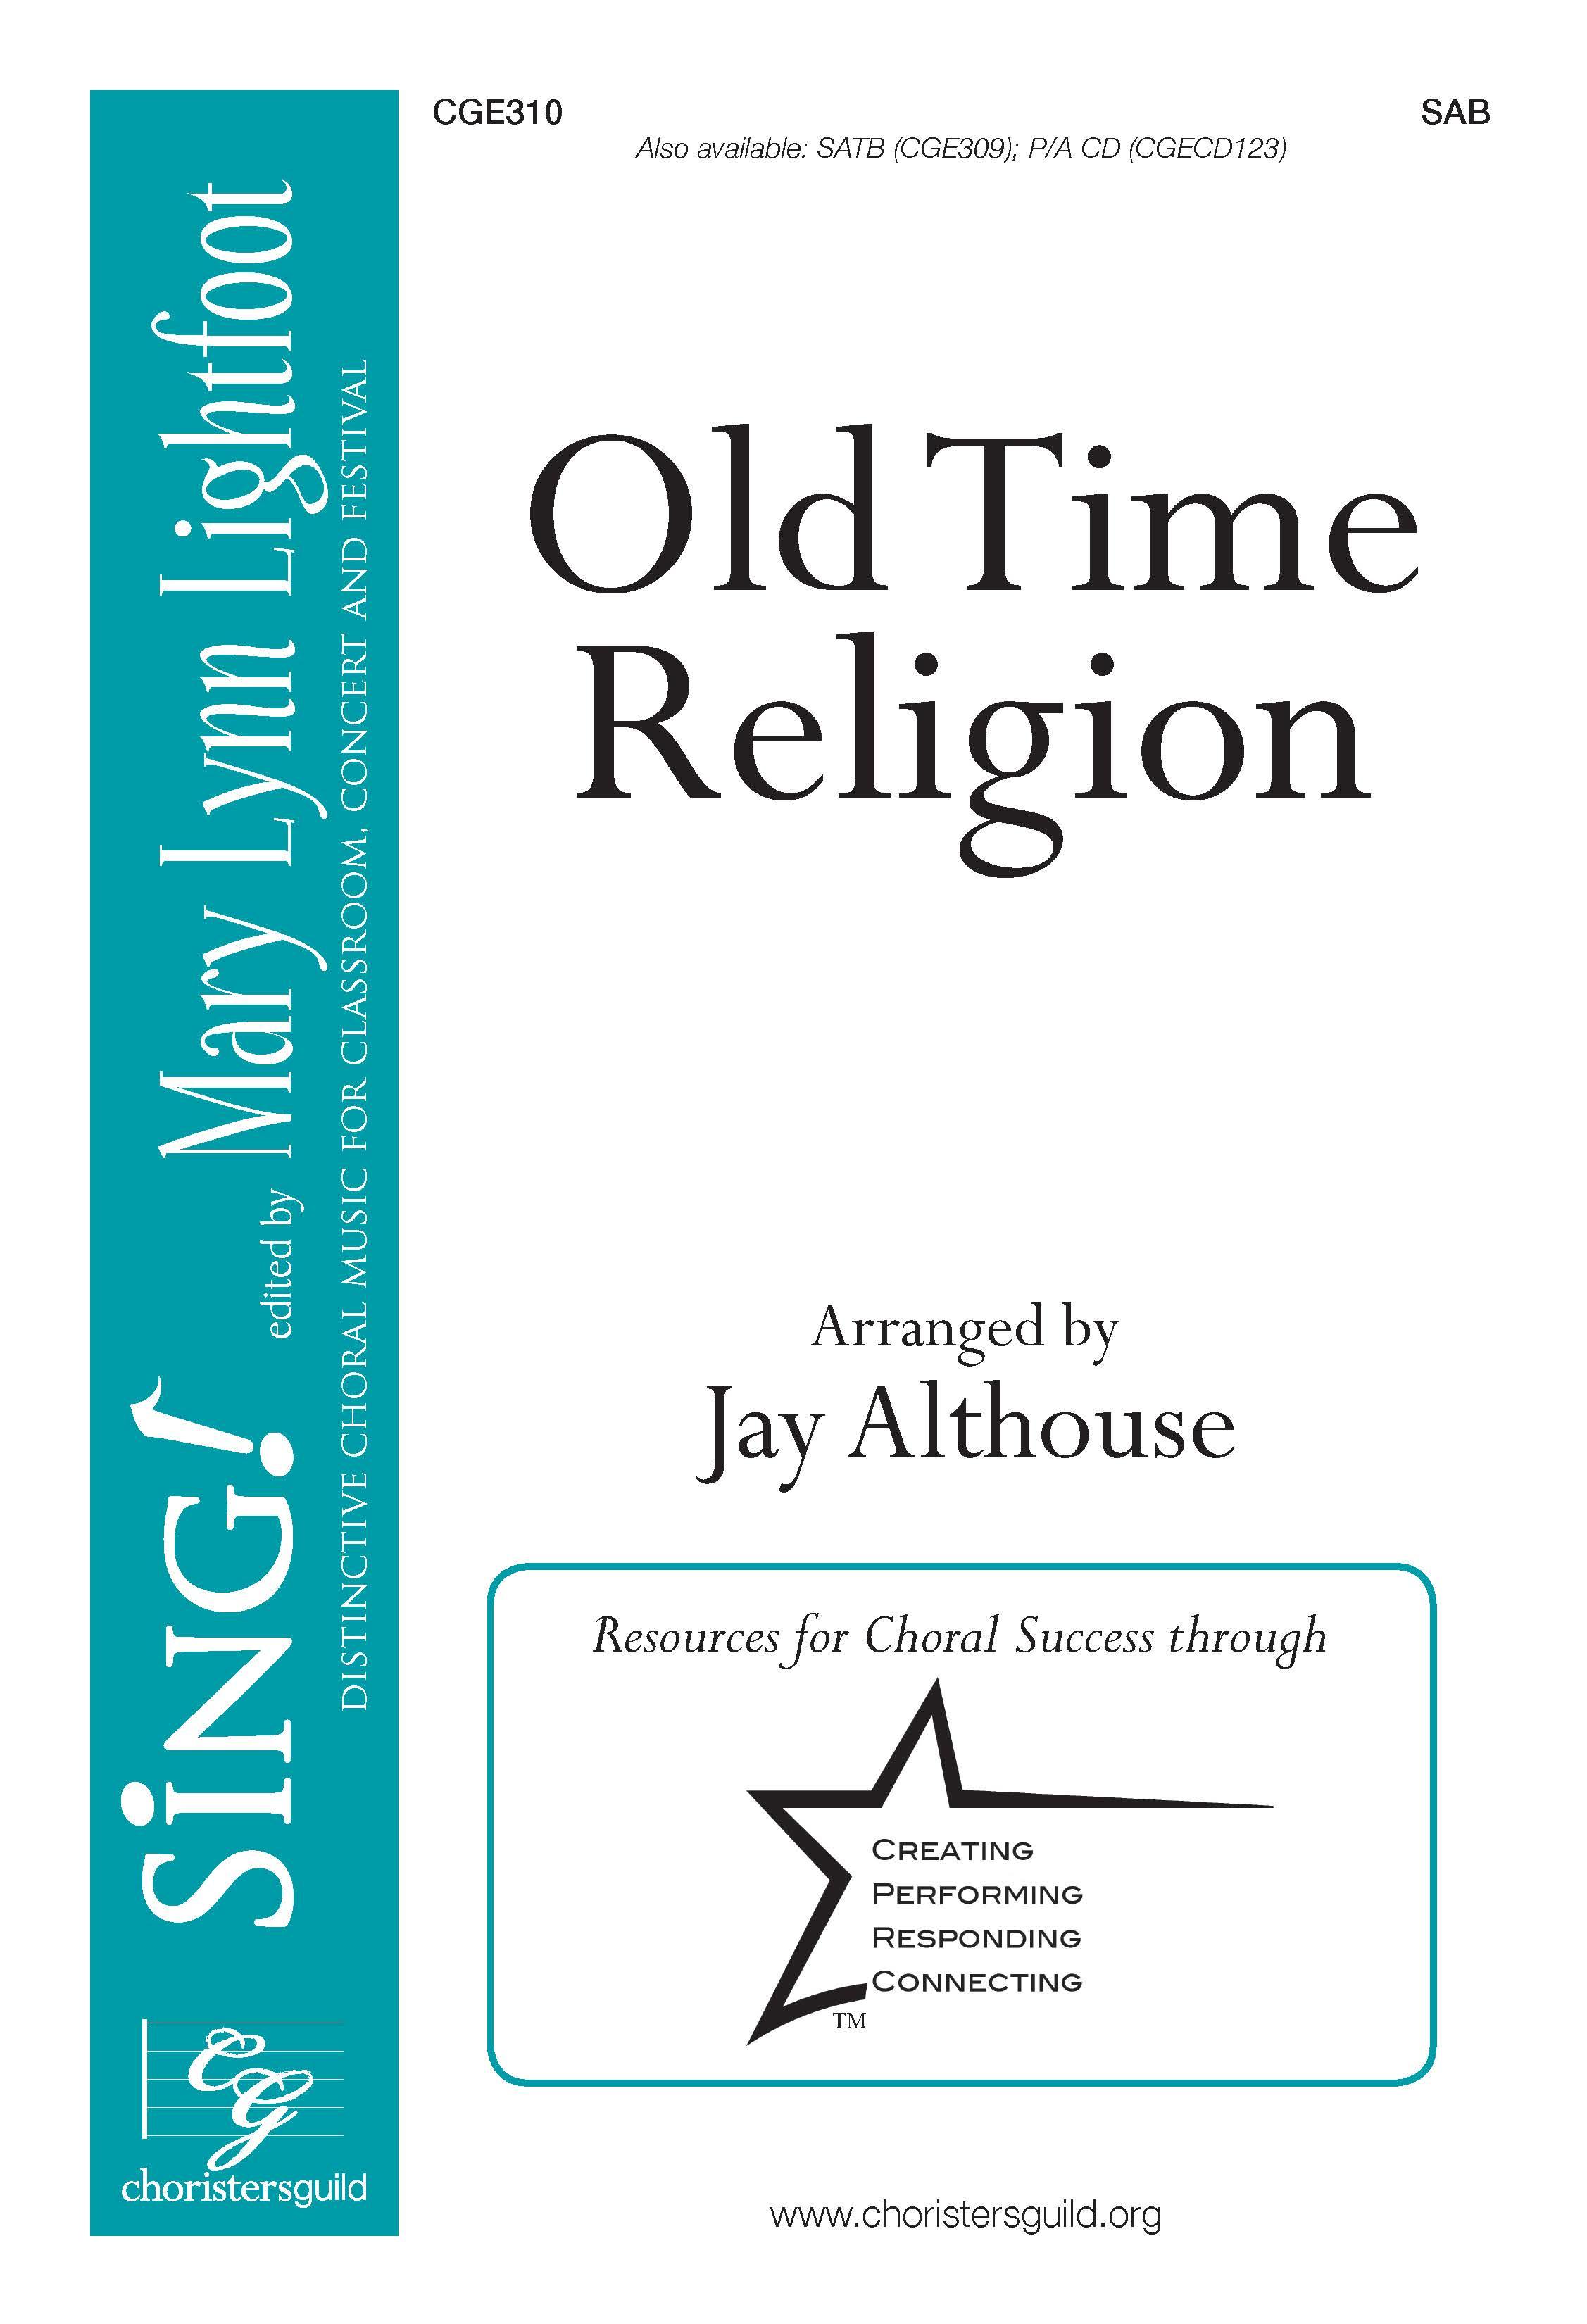 Old Time Religion - SAB